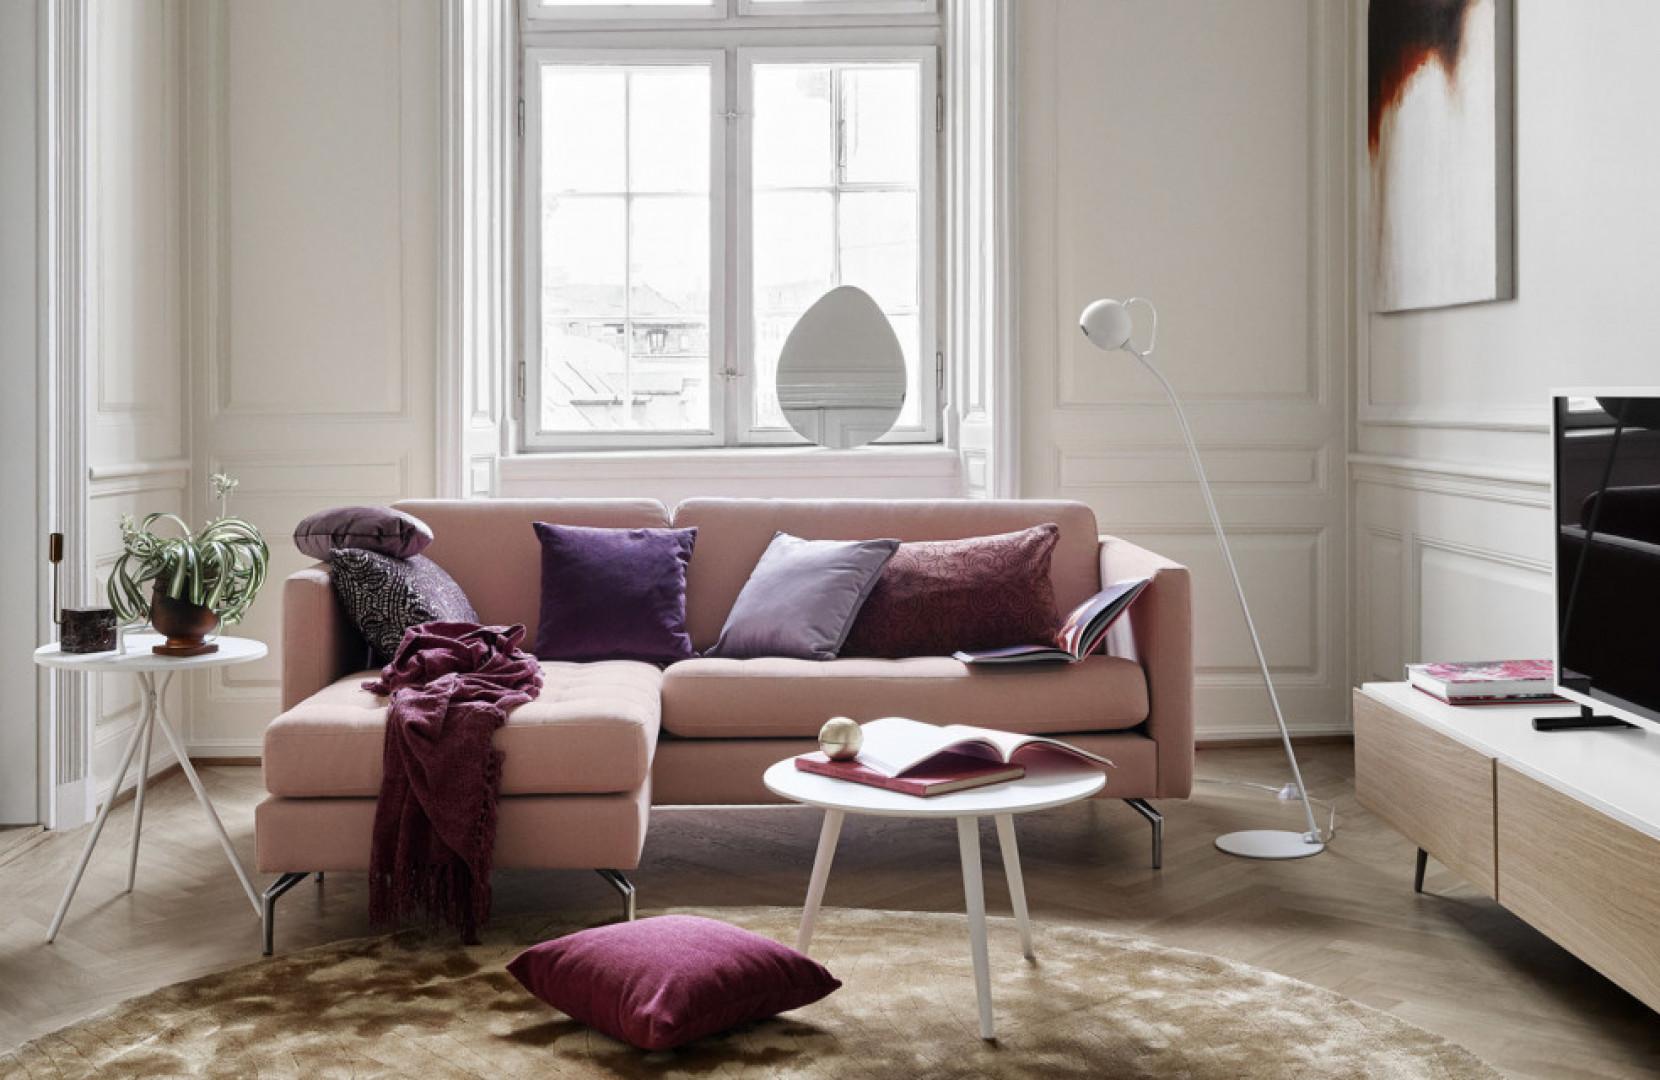 Sofa Indivia firmy BoConcept. Projekt: Anders Nørgaard. Fot. BoConcept